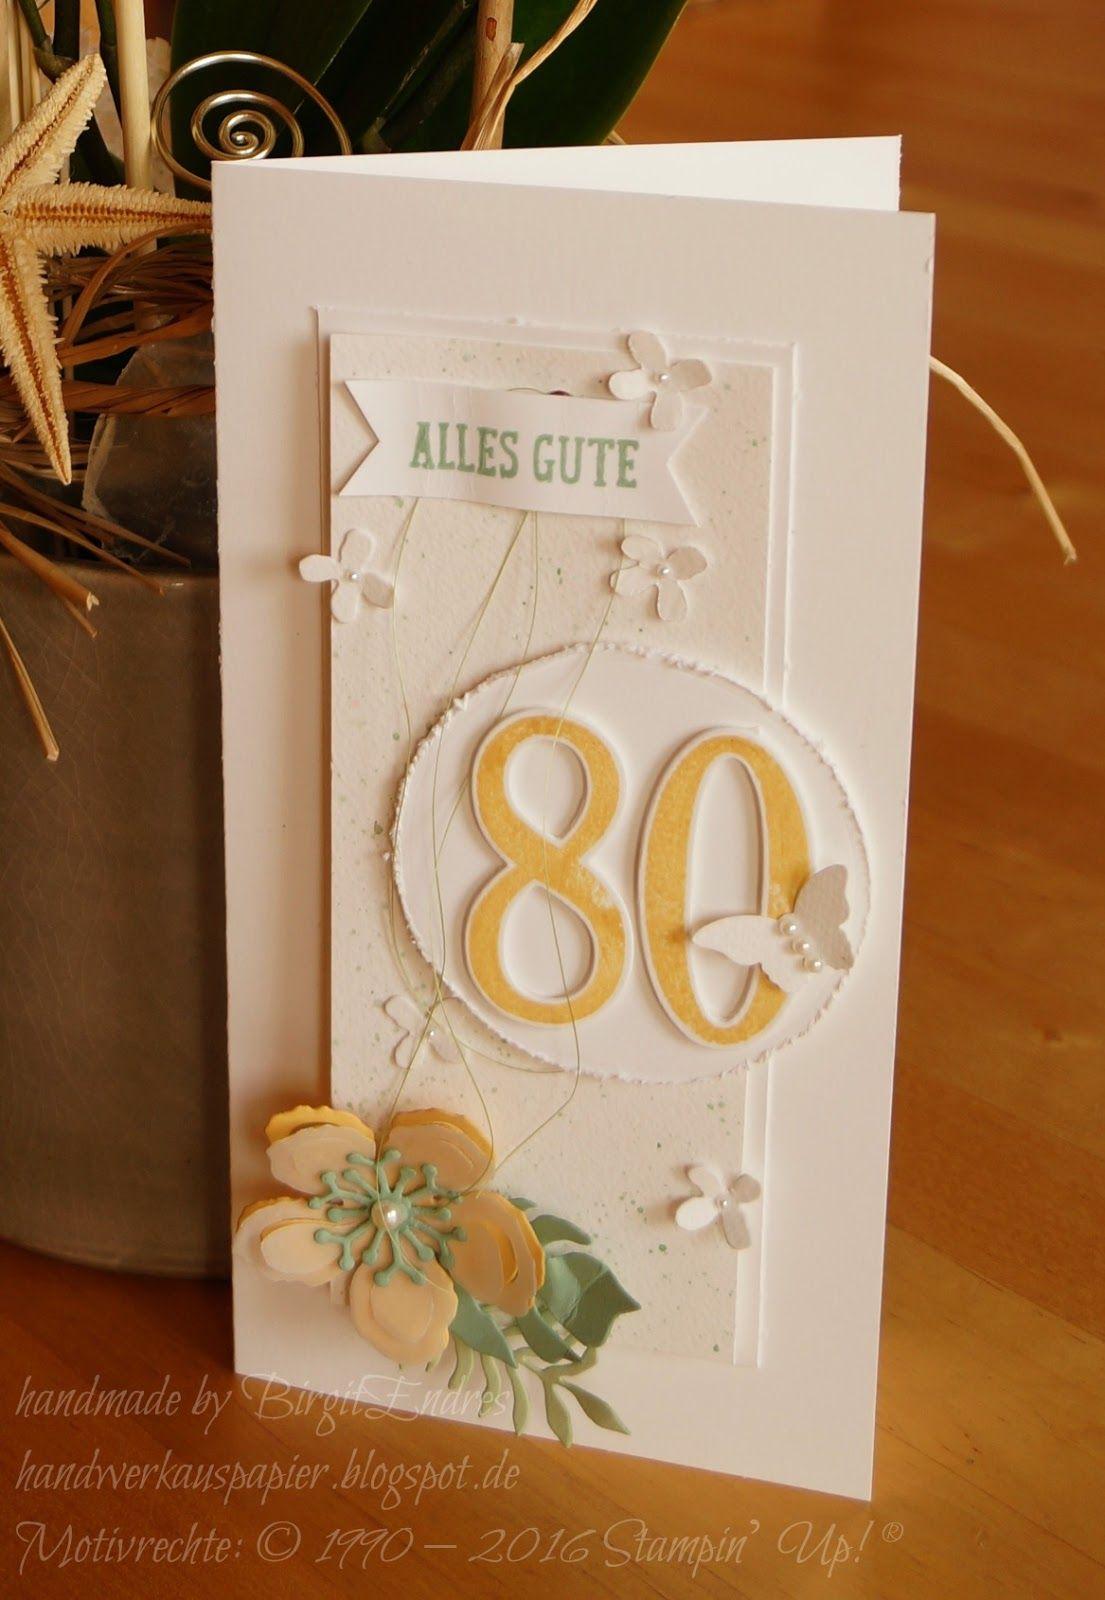 Geschenkideen zum 80 geburtstag tante